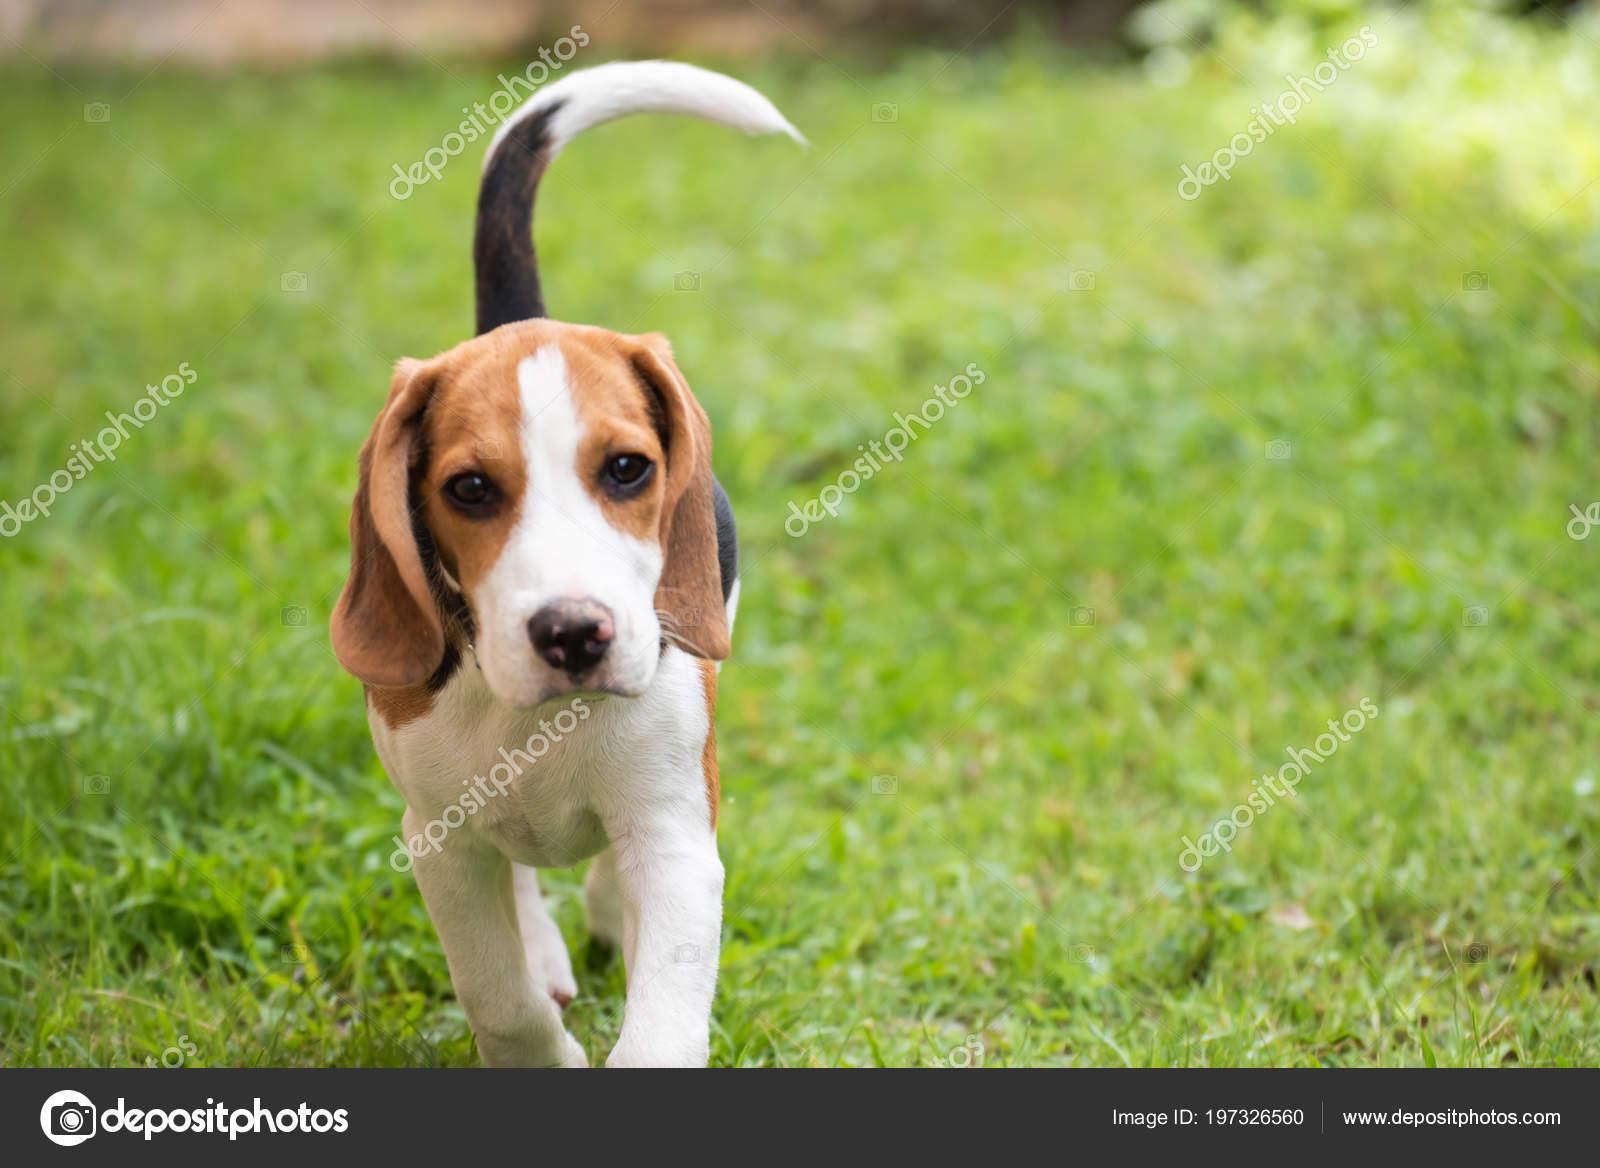 Cute Beagle Dog Running Grass Stock Photo C Woraphon N Gmail Com